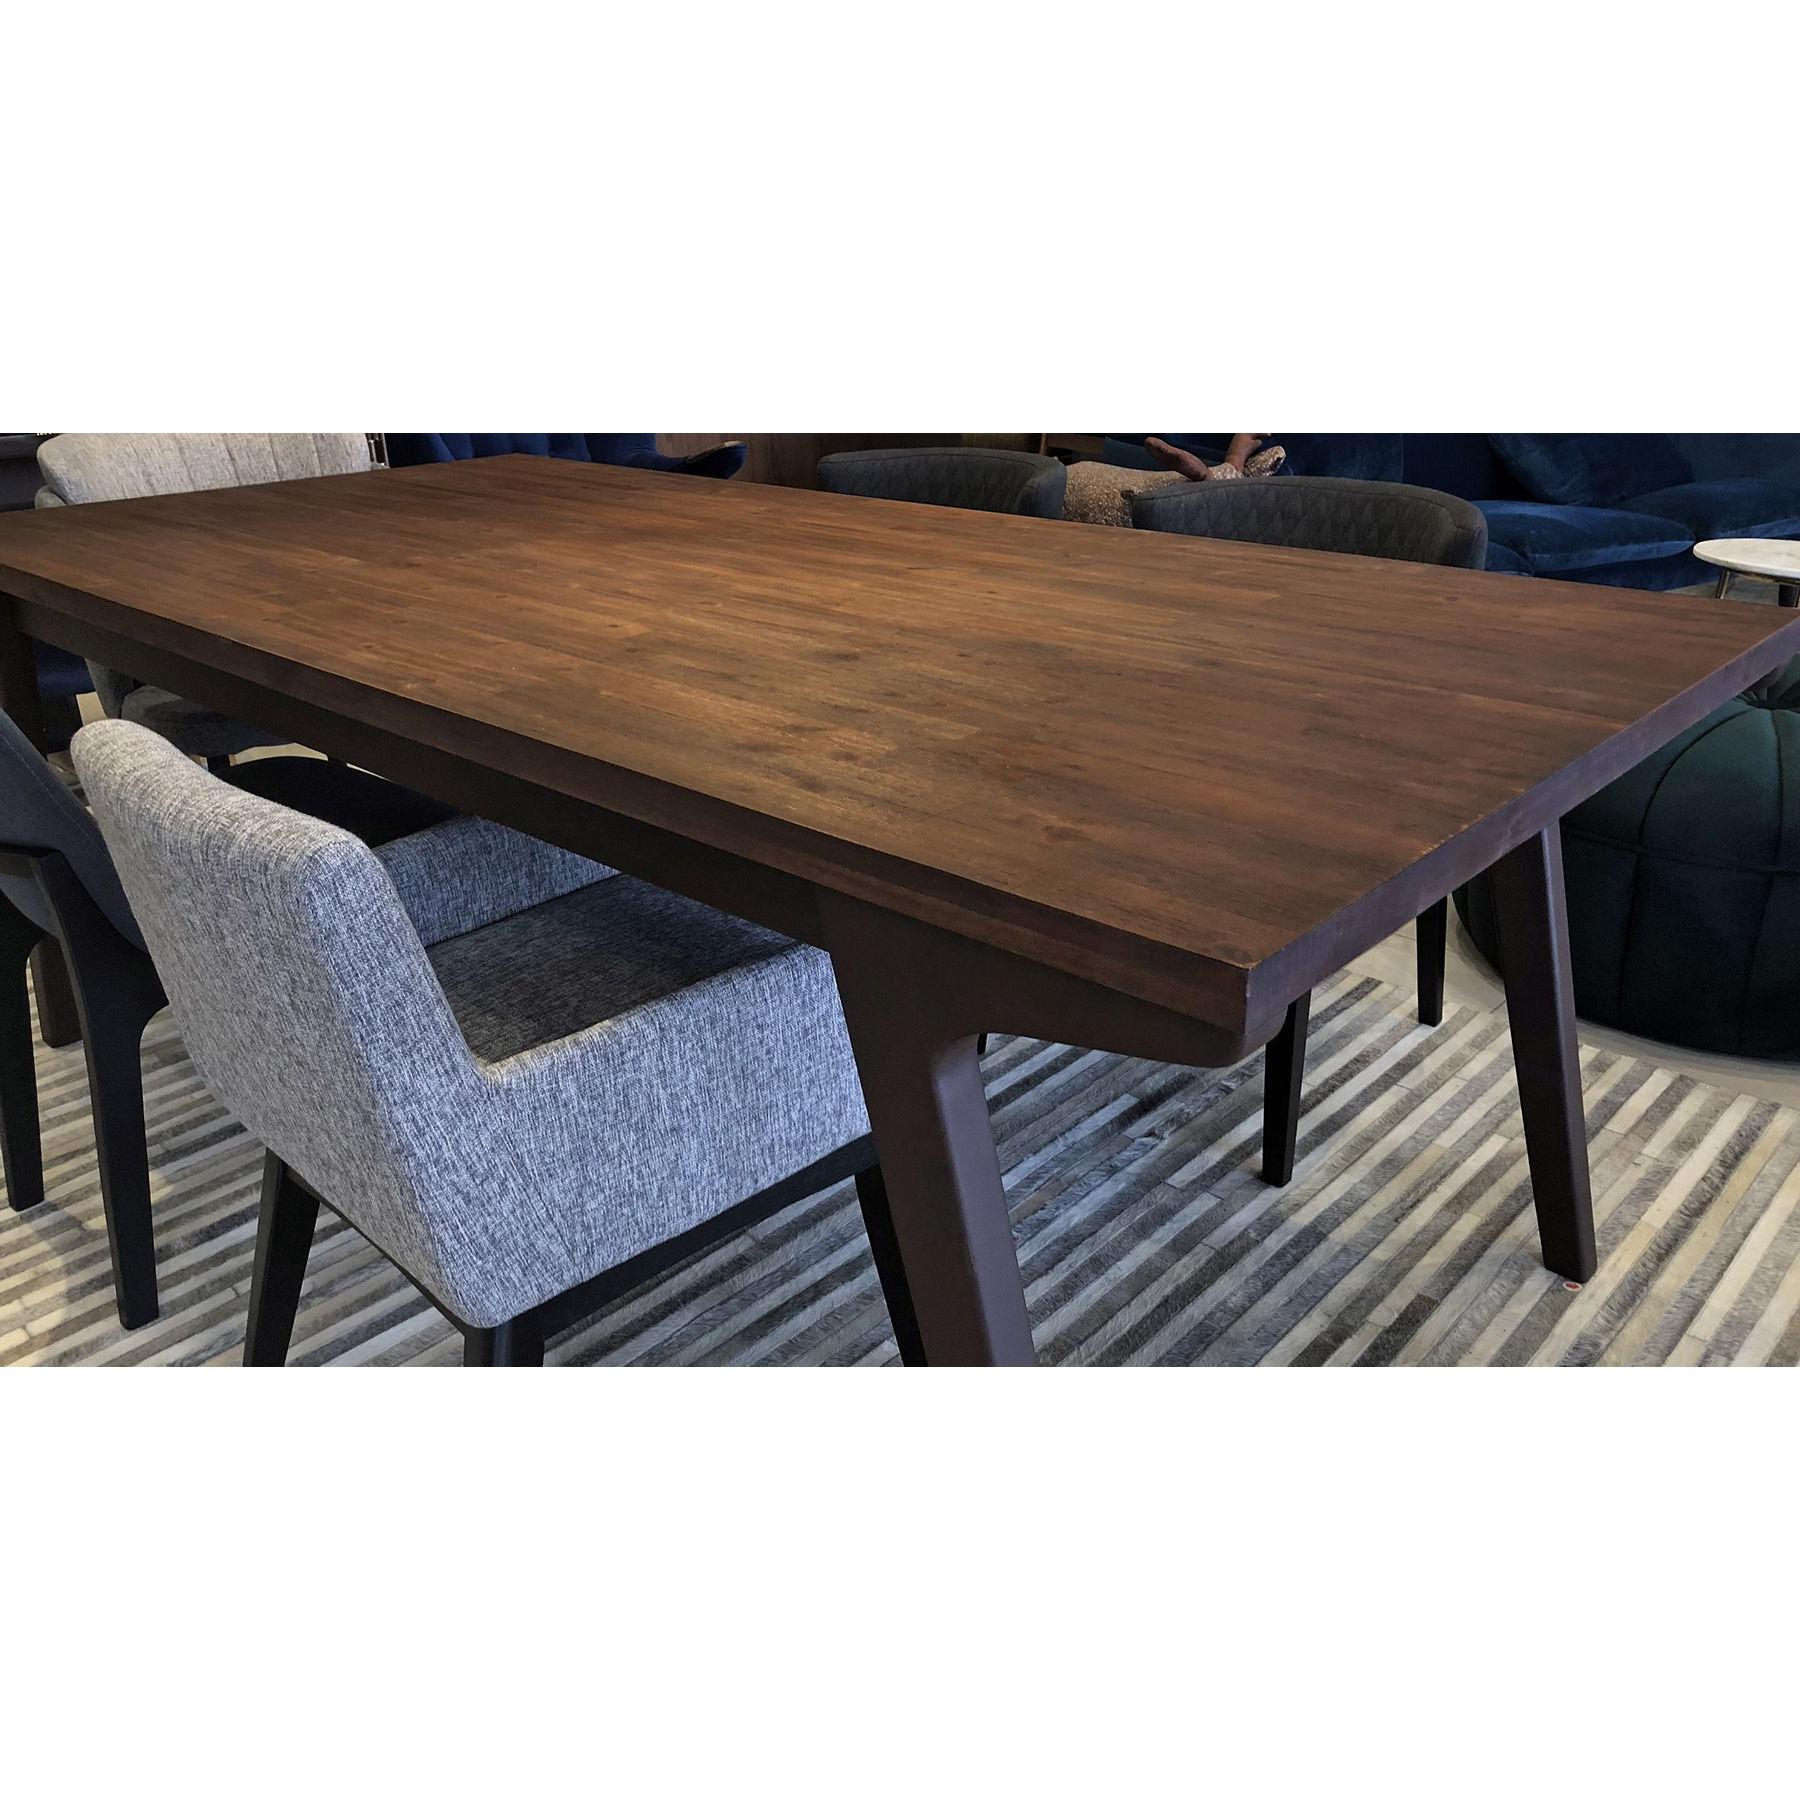 2017 Unique Acacia Wood Dining Tables With Gaena (210cm Acacia Wood) Dining Table (View 27 of 30)